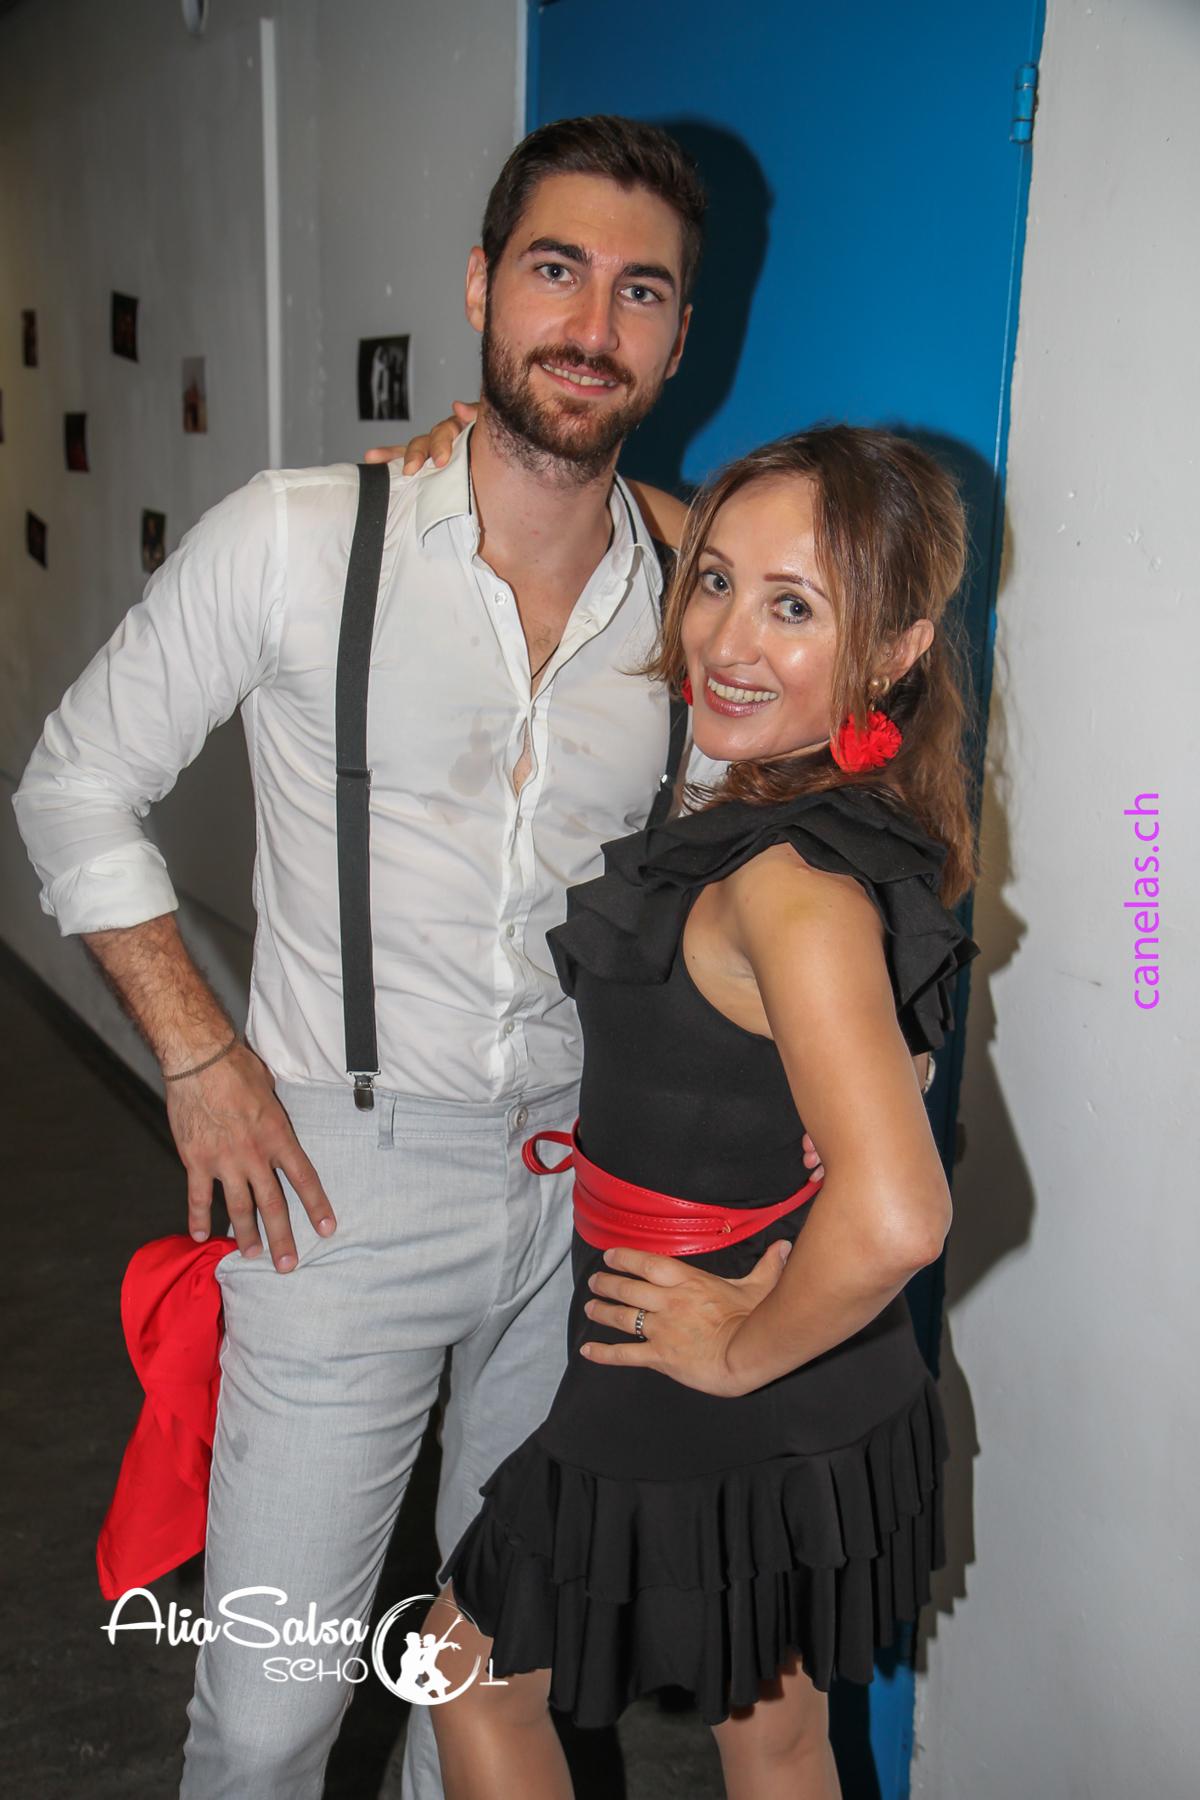 AliaSalsa ecole de danse lausanne soiree bachata salsa cubaineAlia Salsa Soireé Salsa - Bachata-15